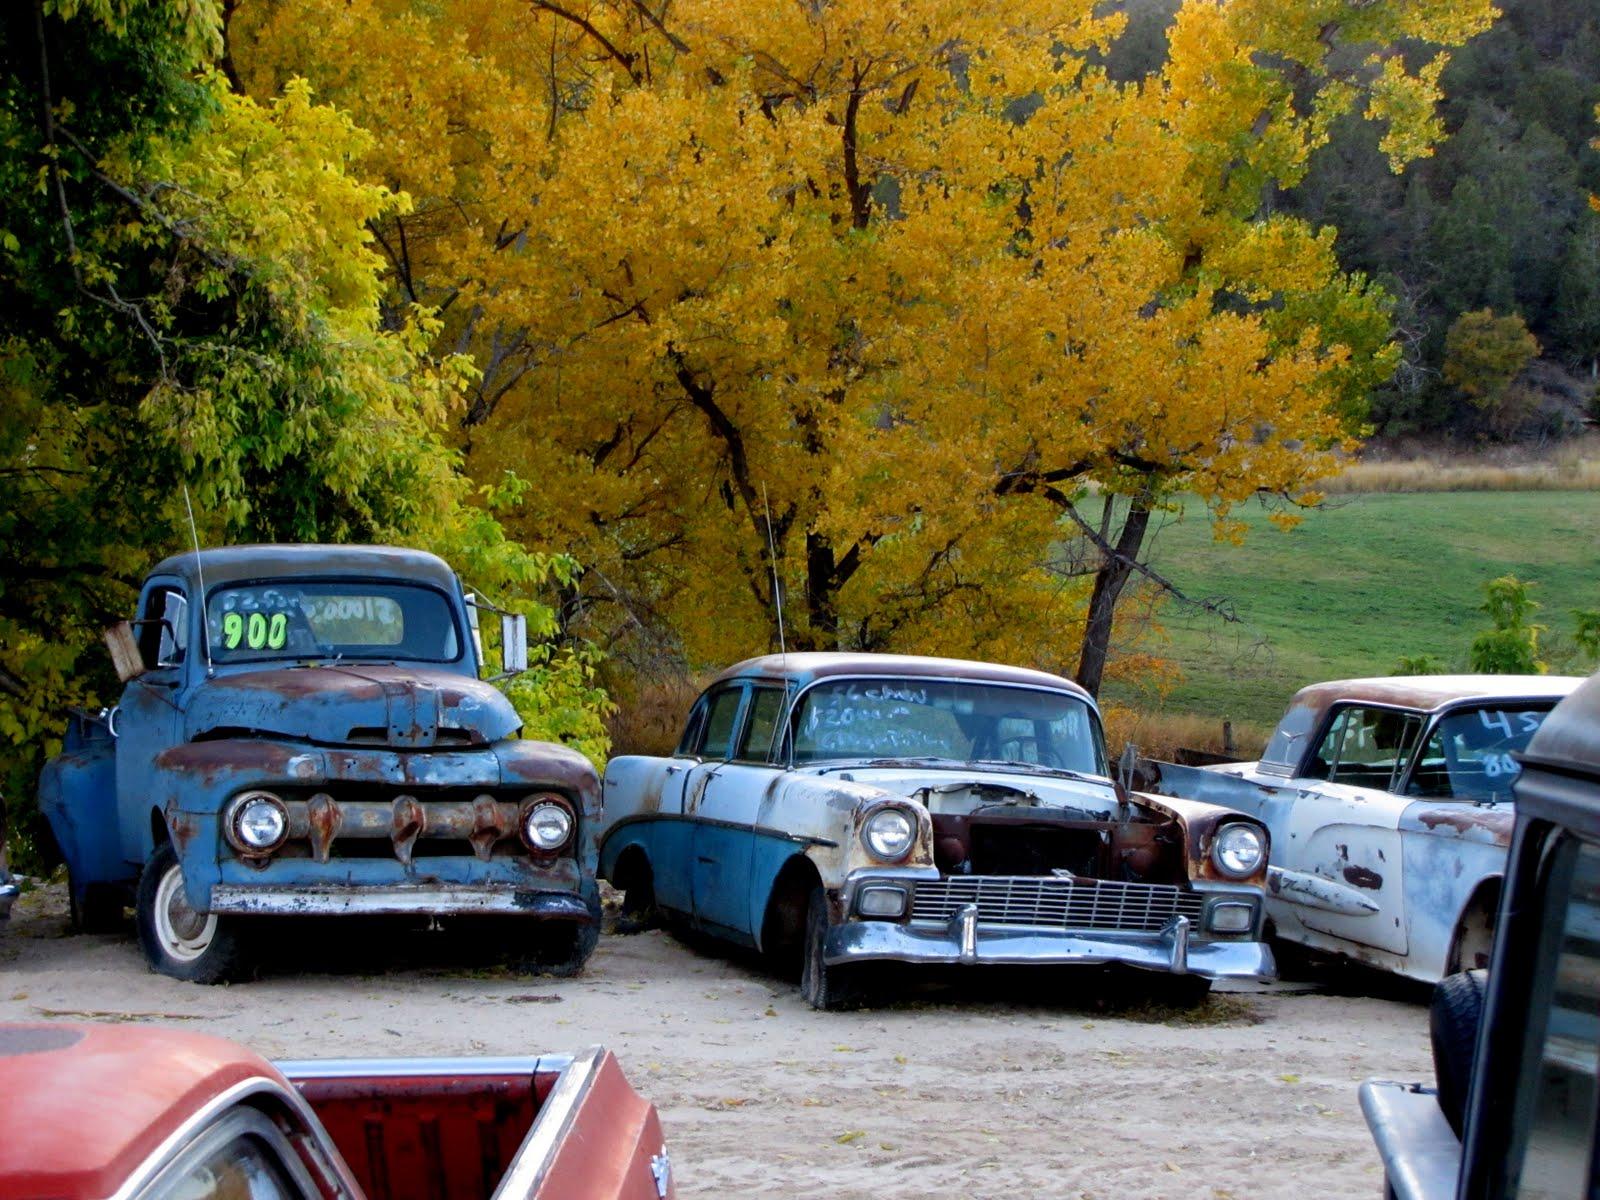 Roncstelep valahol a vadnyugaton, Utah Wrecks, somewhere in Utah, 1952 Ford F10, 1956 Chevrolet Bel Air